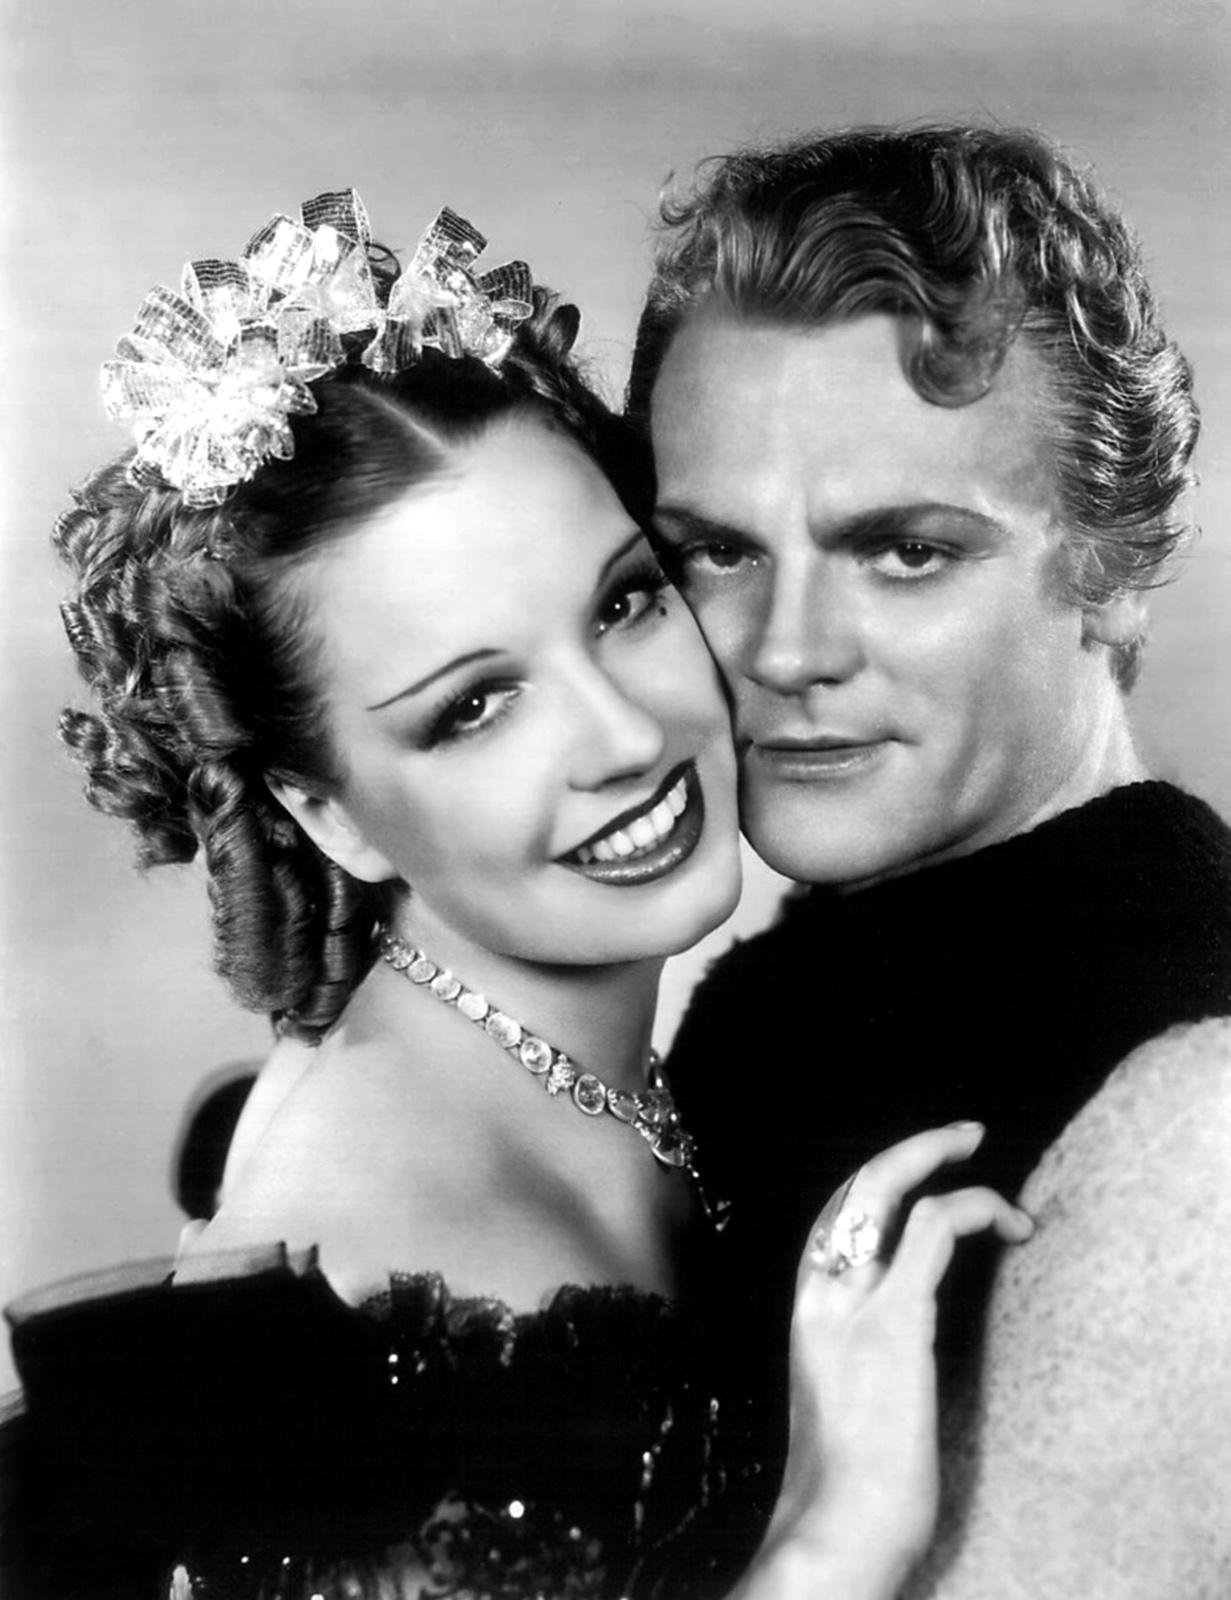 Lili Damita with James Cagney